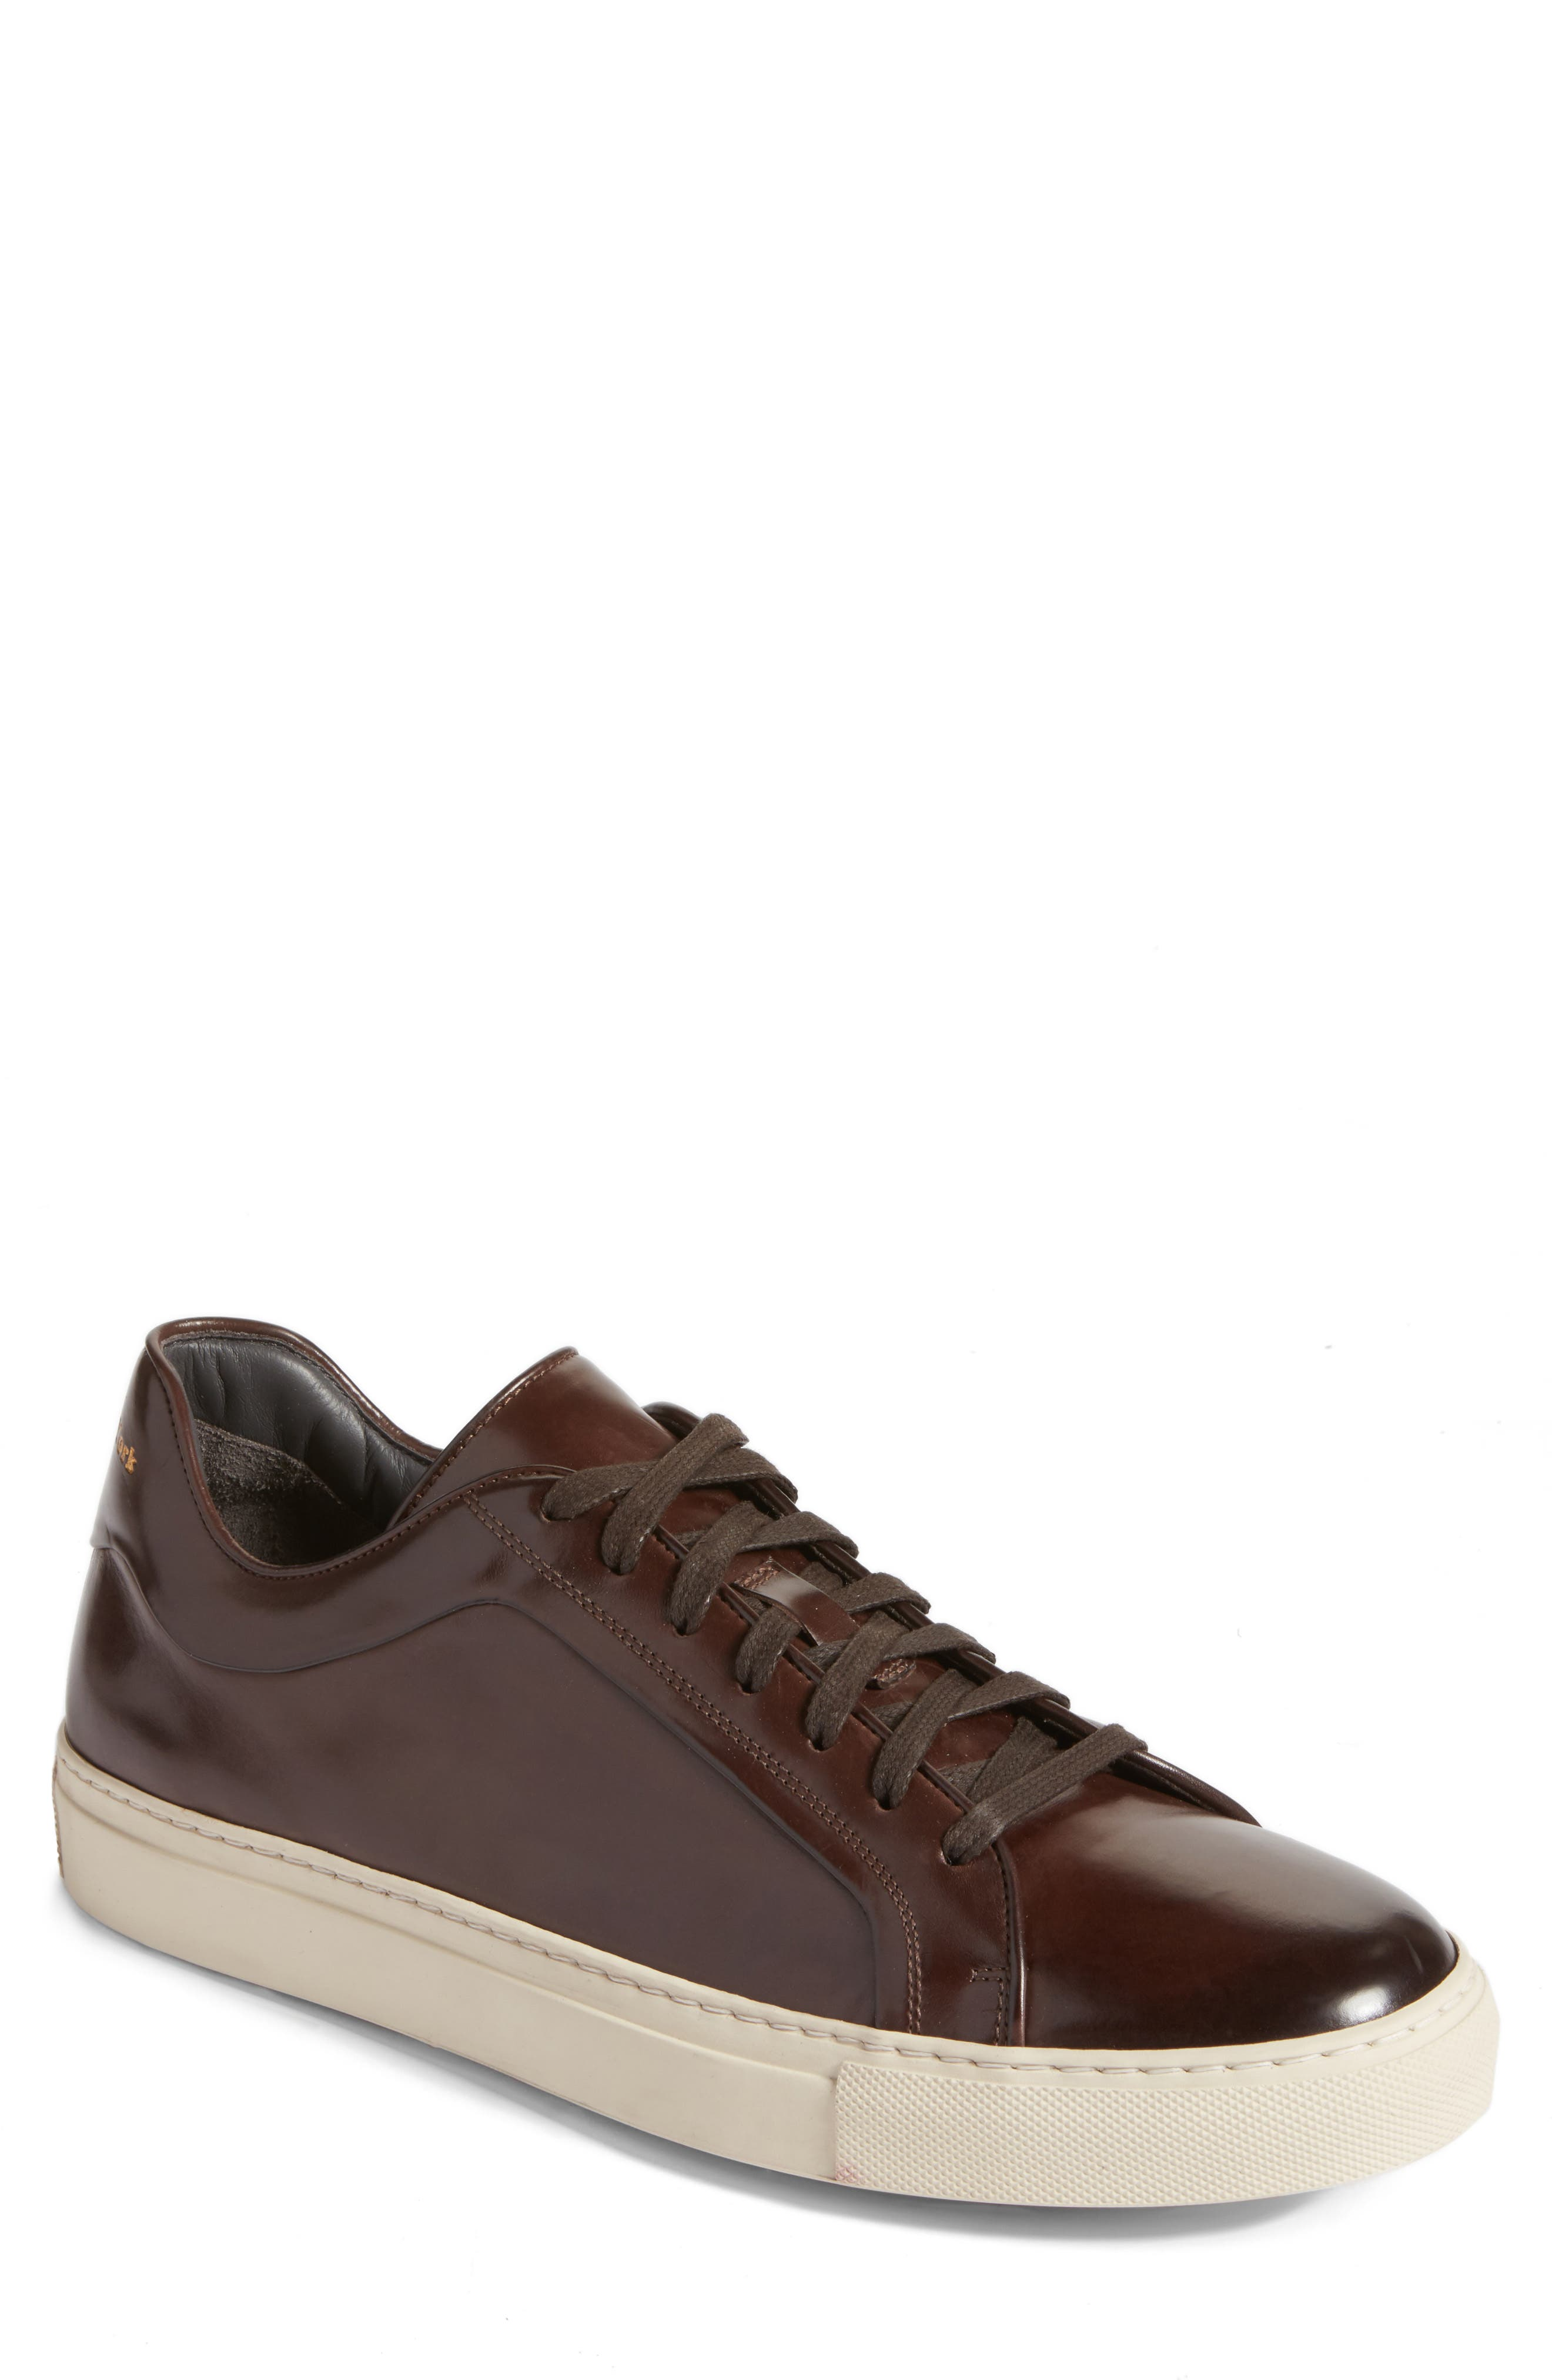 Marshall Sneaker,                             Main thumbnail 8, color,